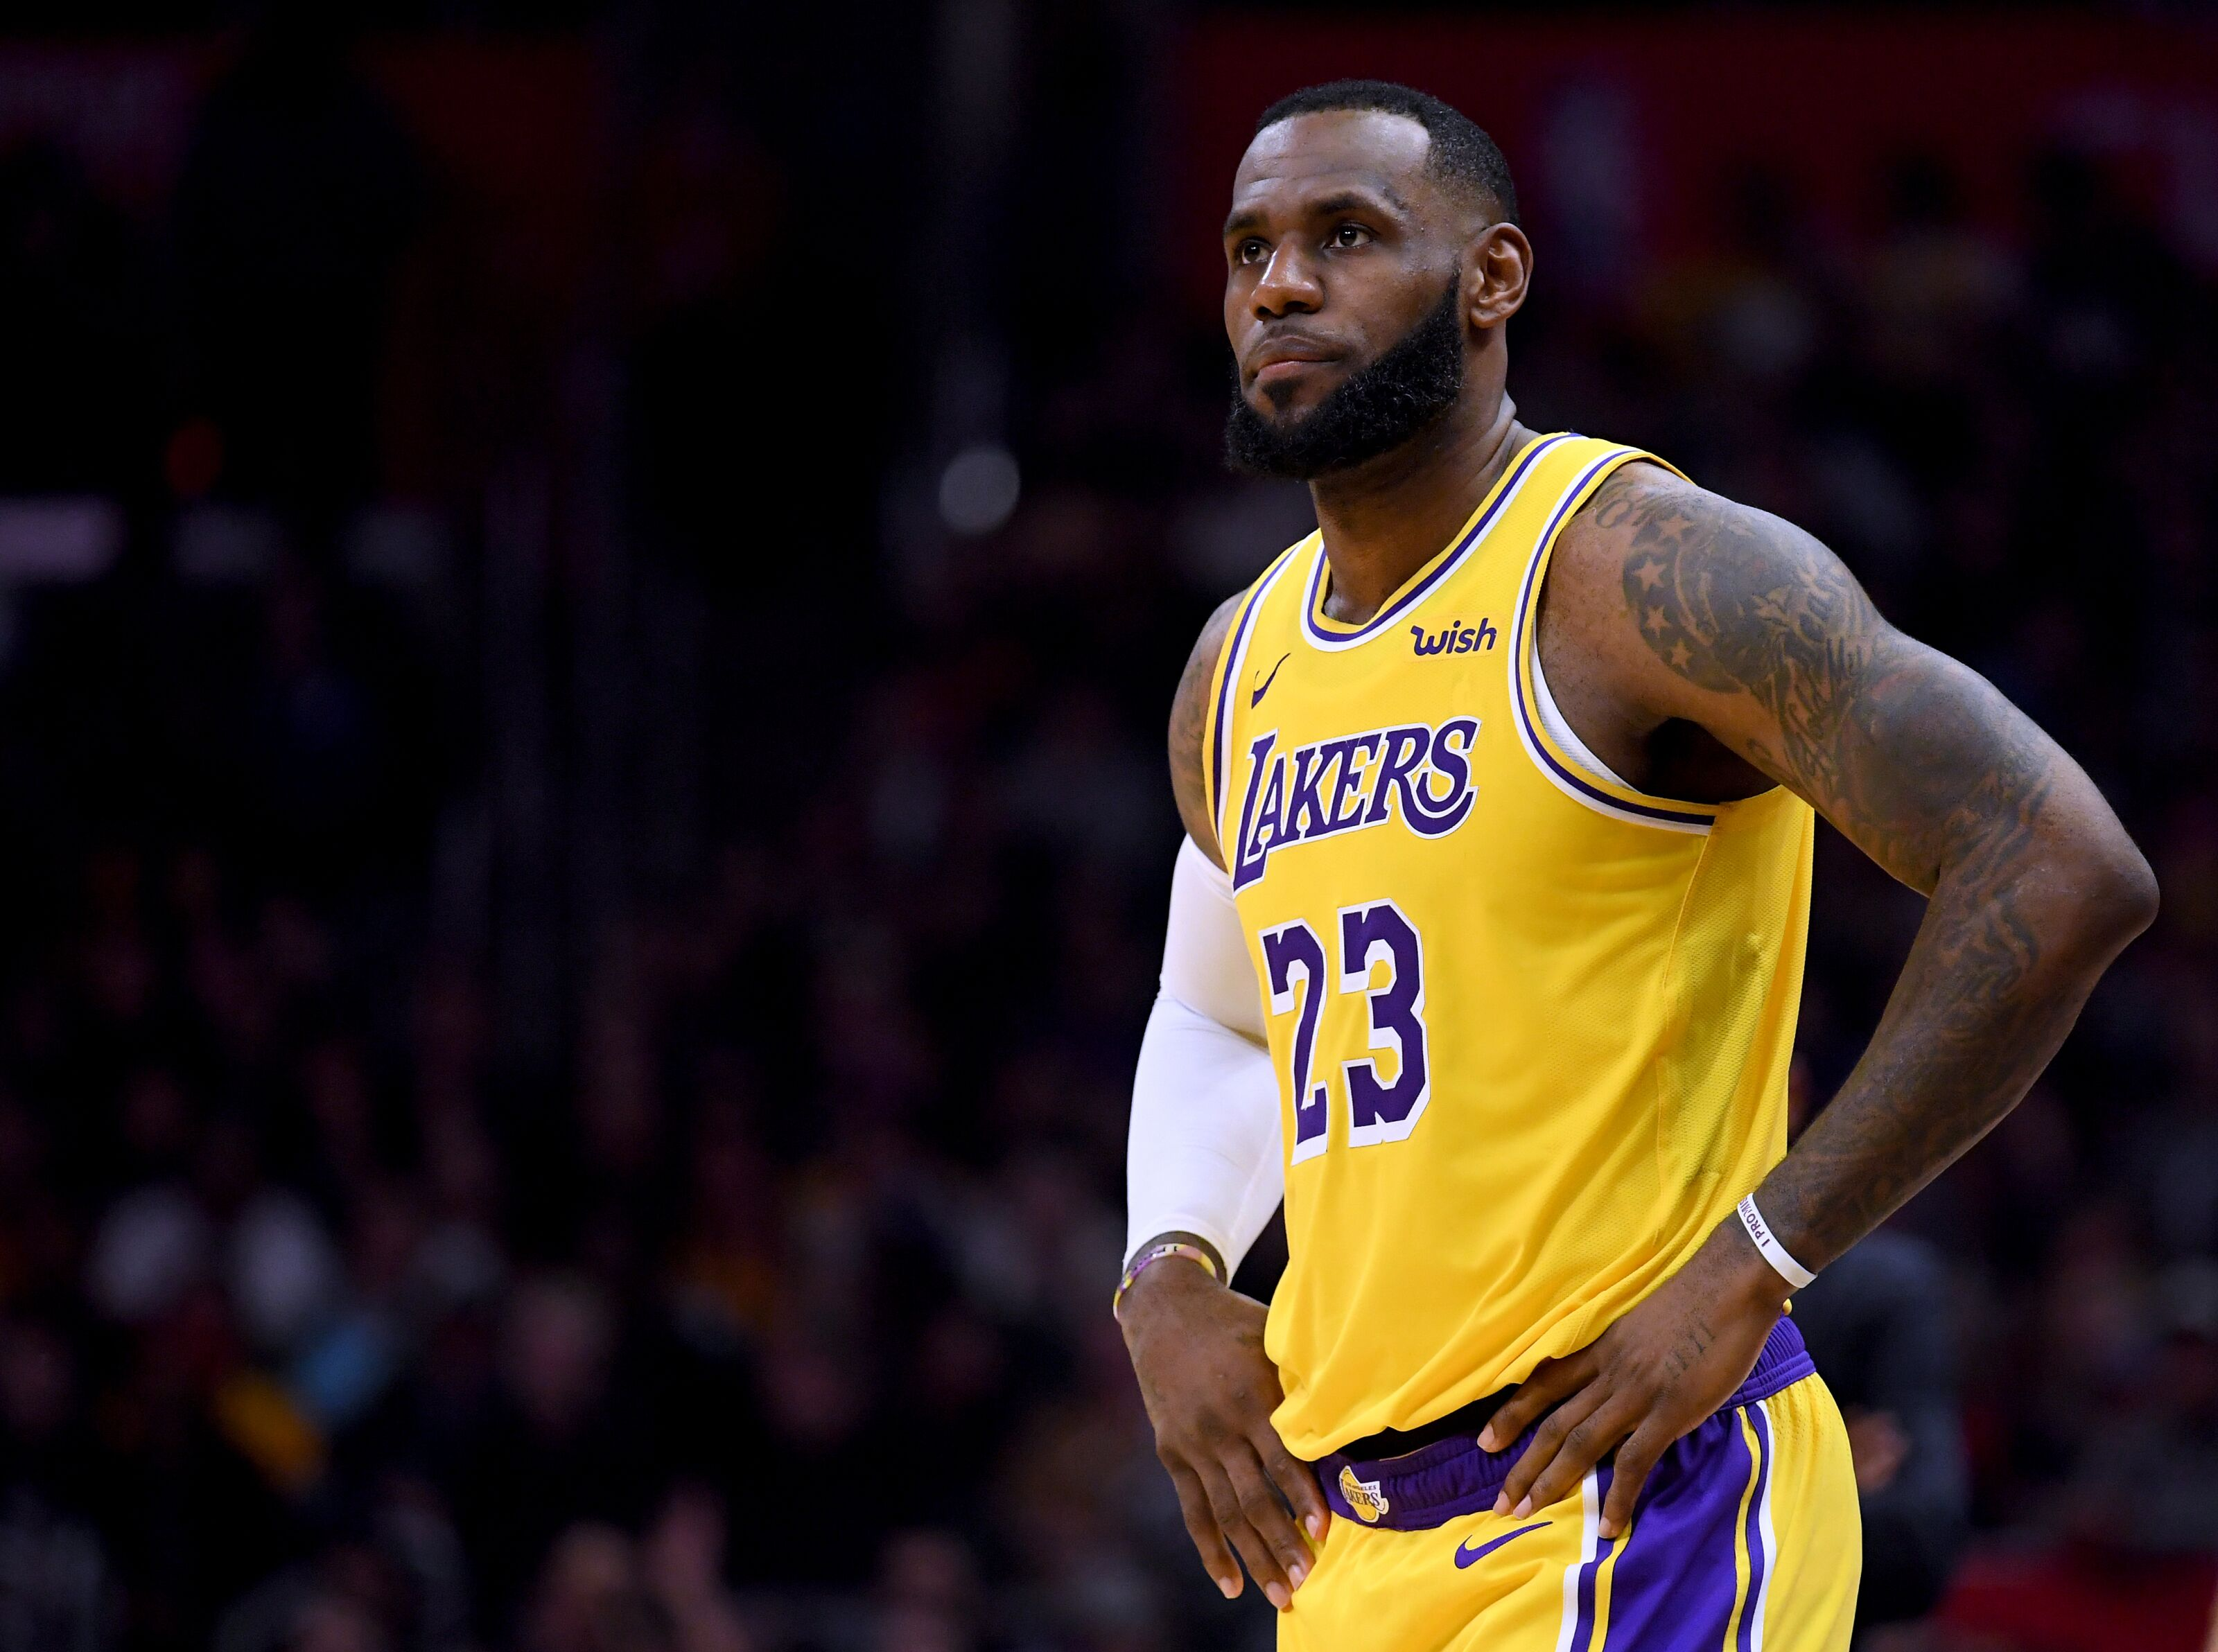 Los Angeles Lakers: Does LA regret signing LeBron James?